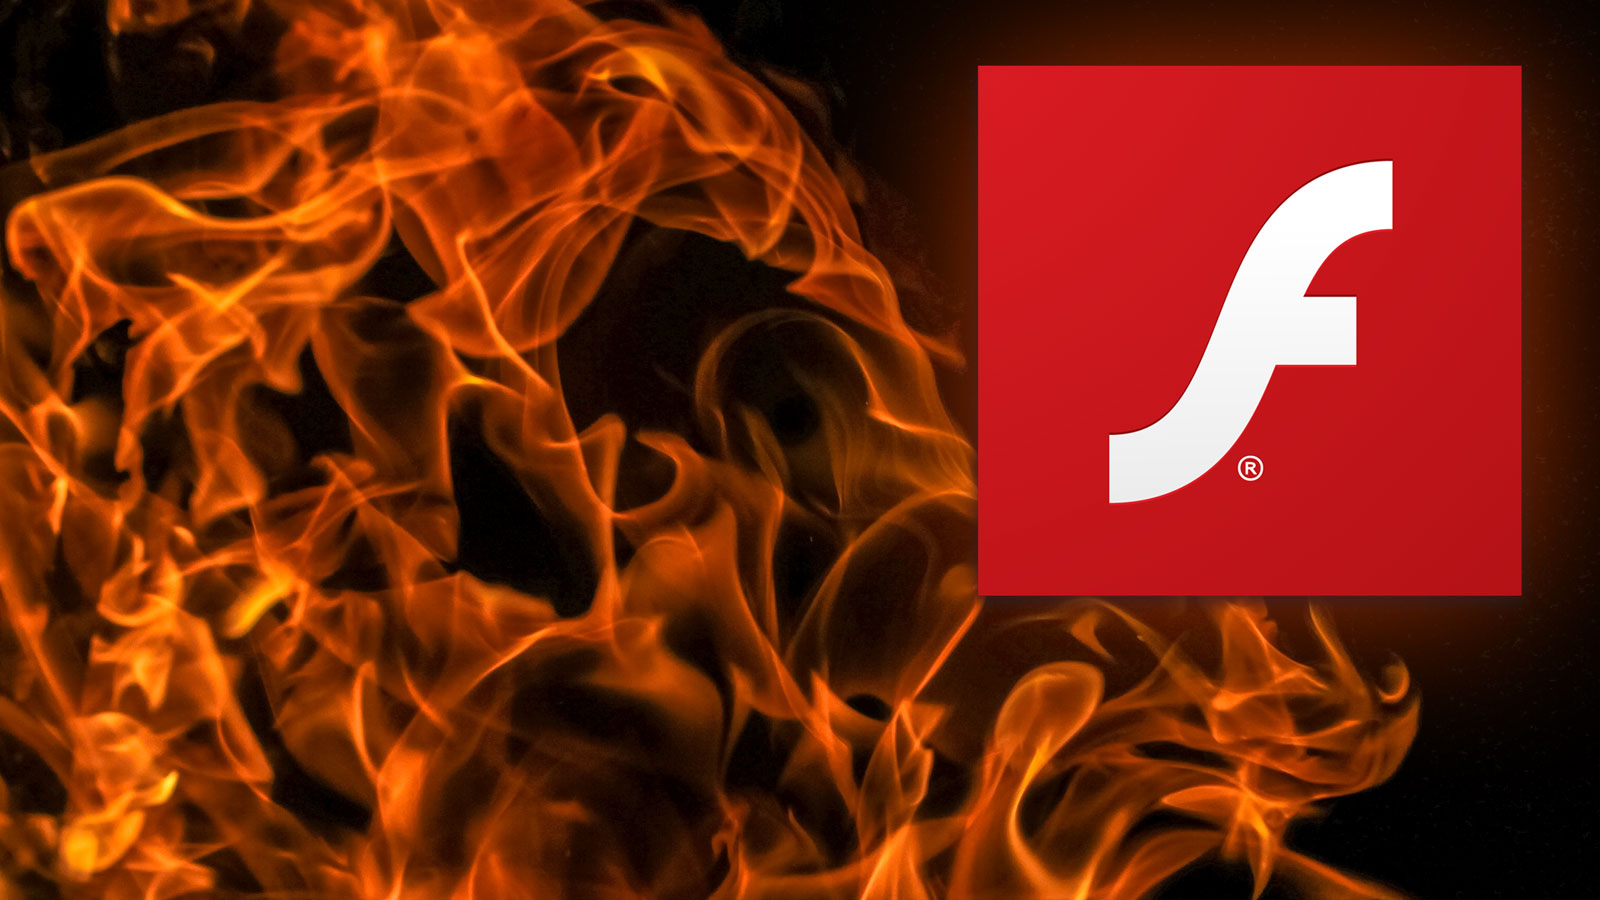 Adobe Flash Professional CC Crack Free 21.0.6 [Full Download] 2021